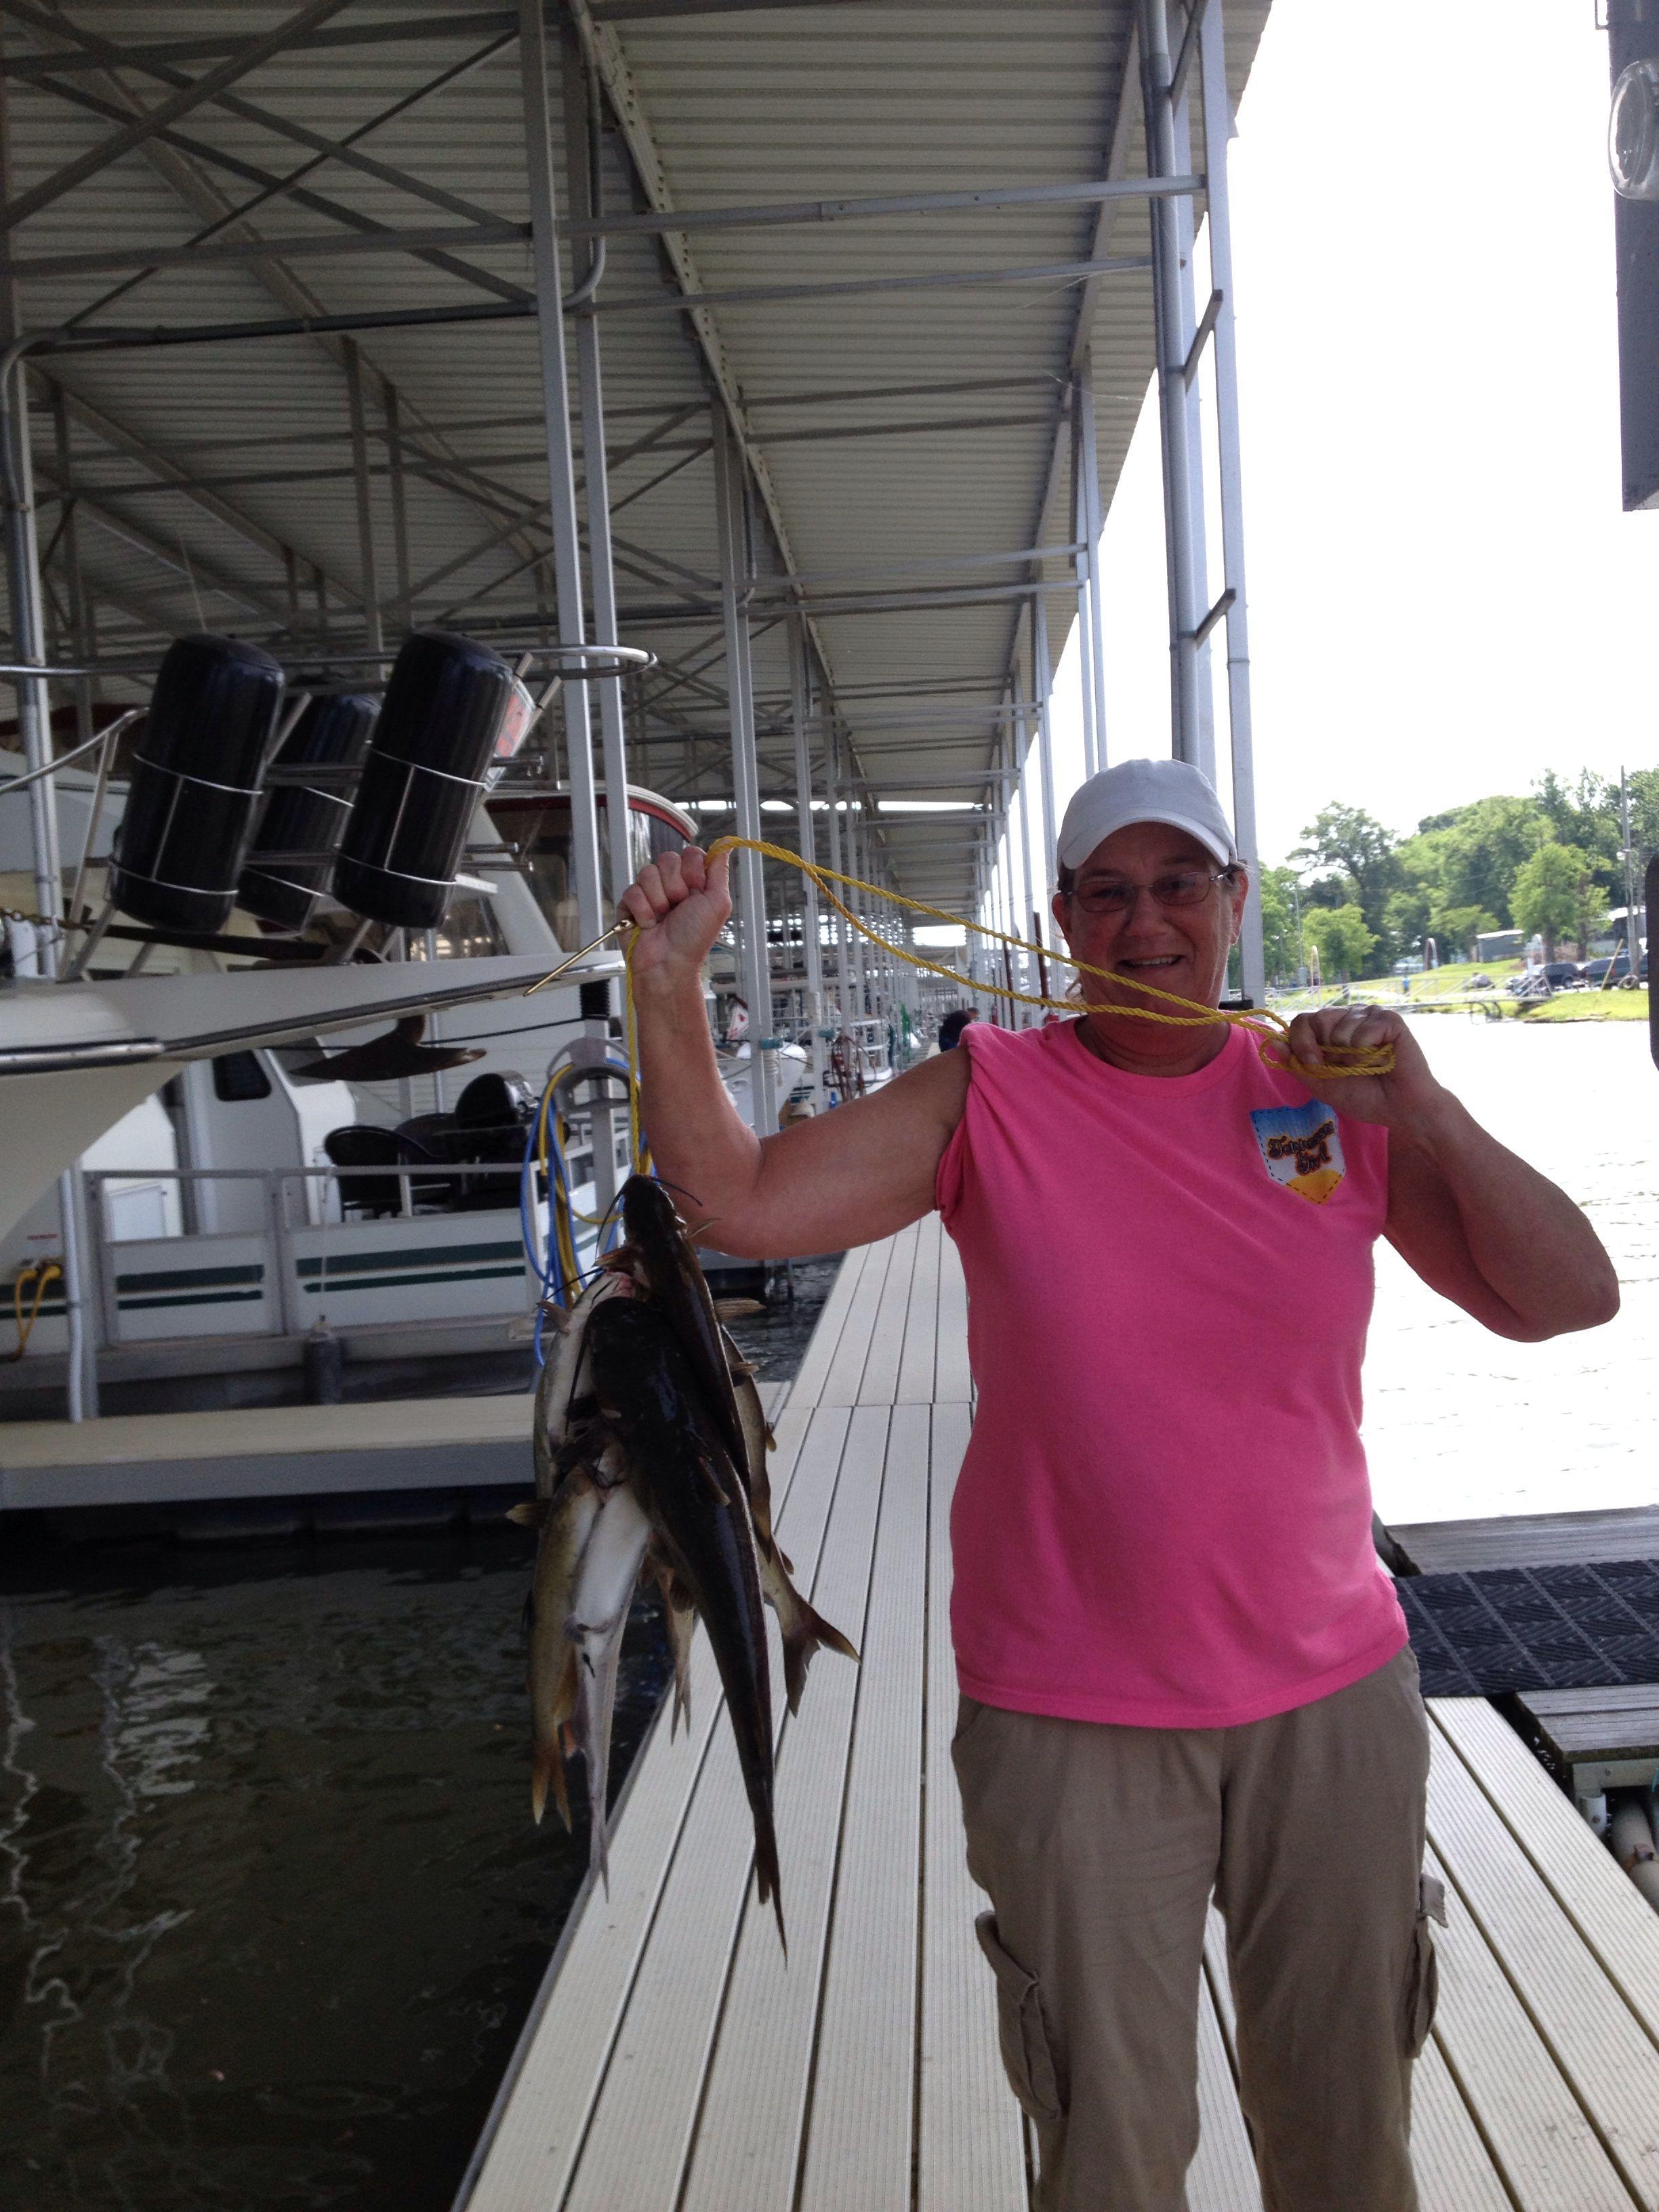 Just fishin